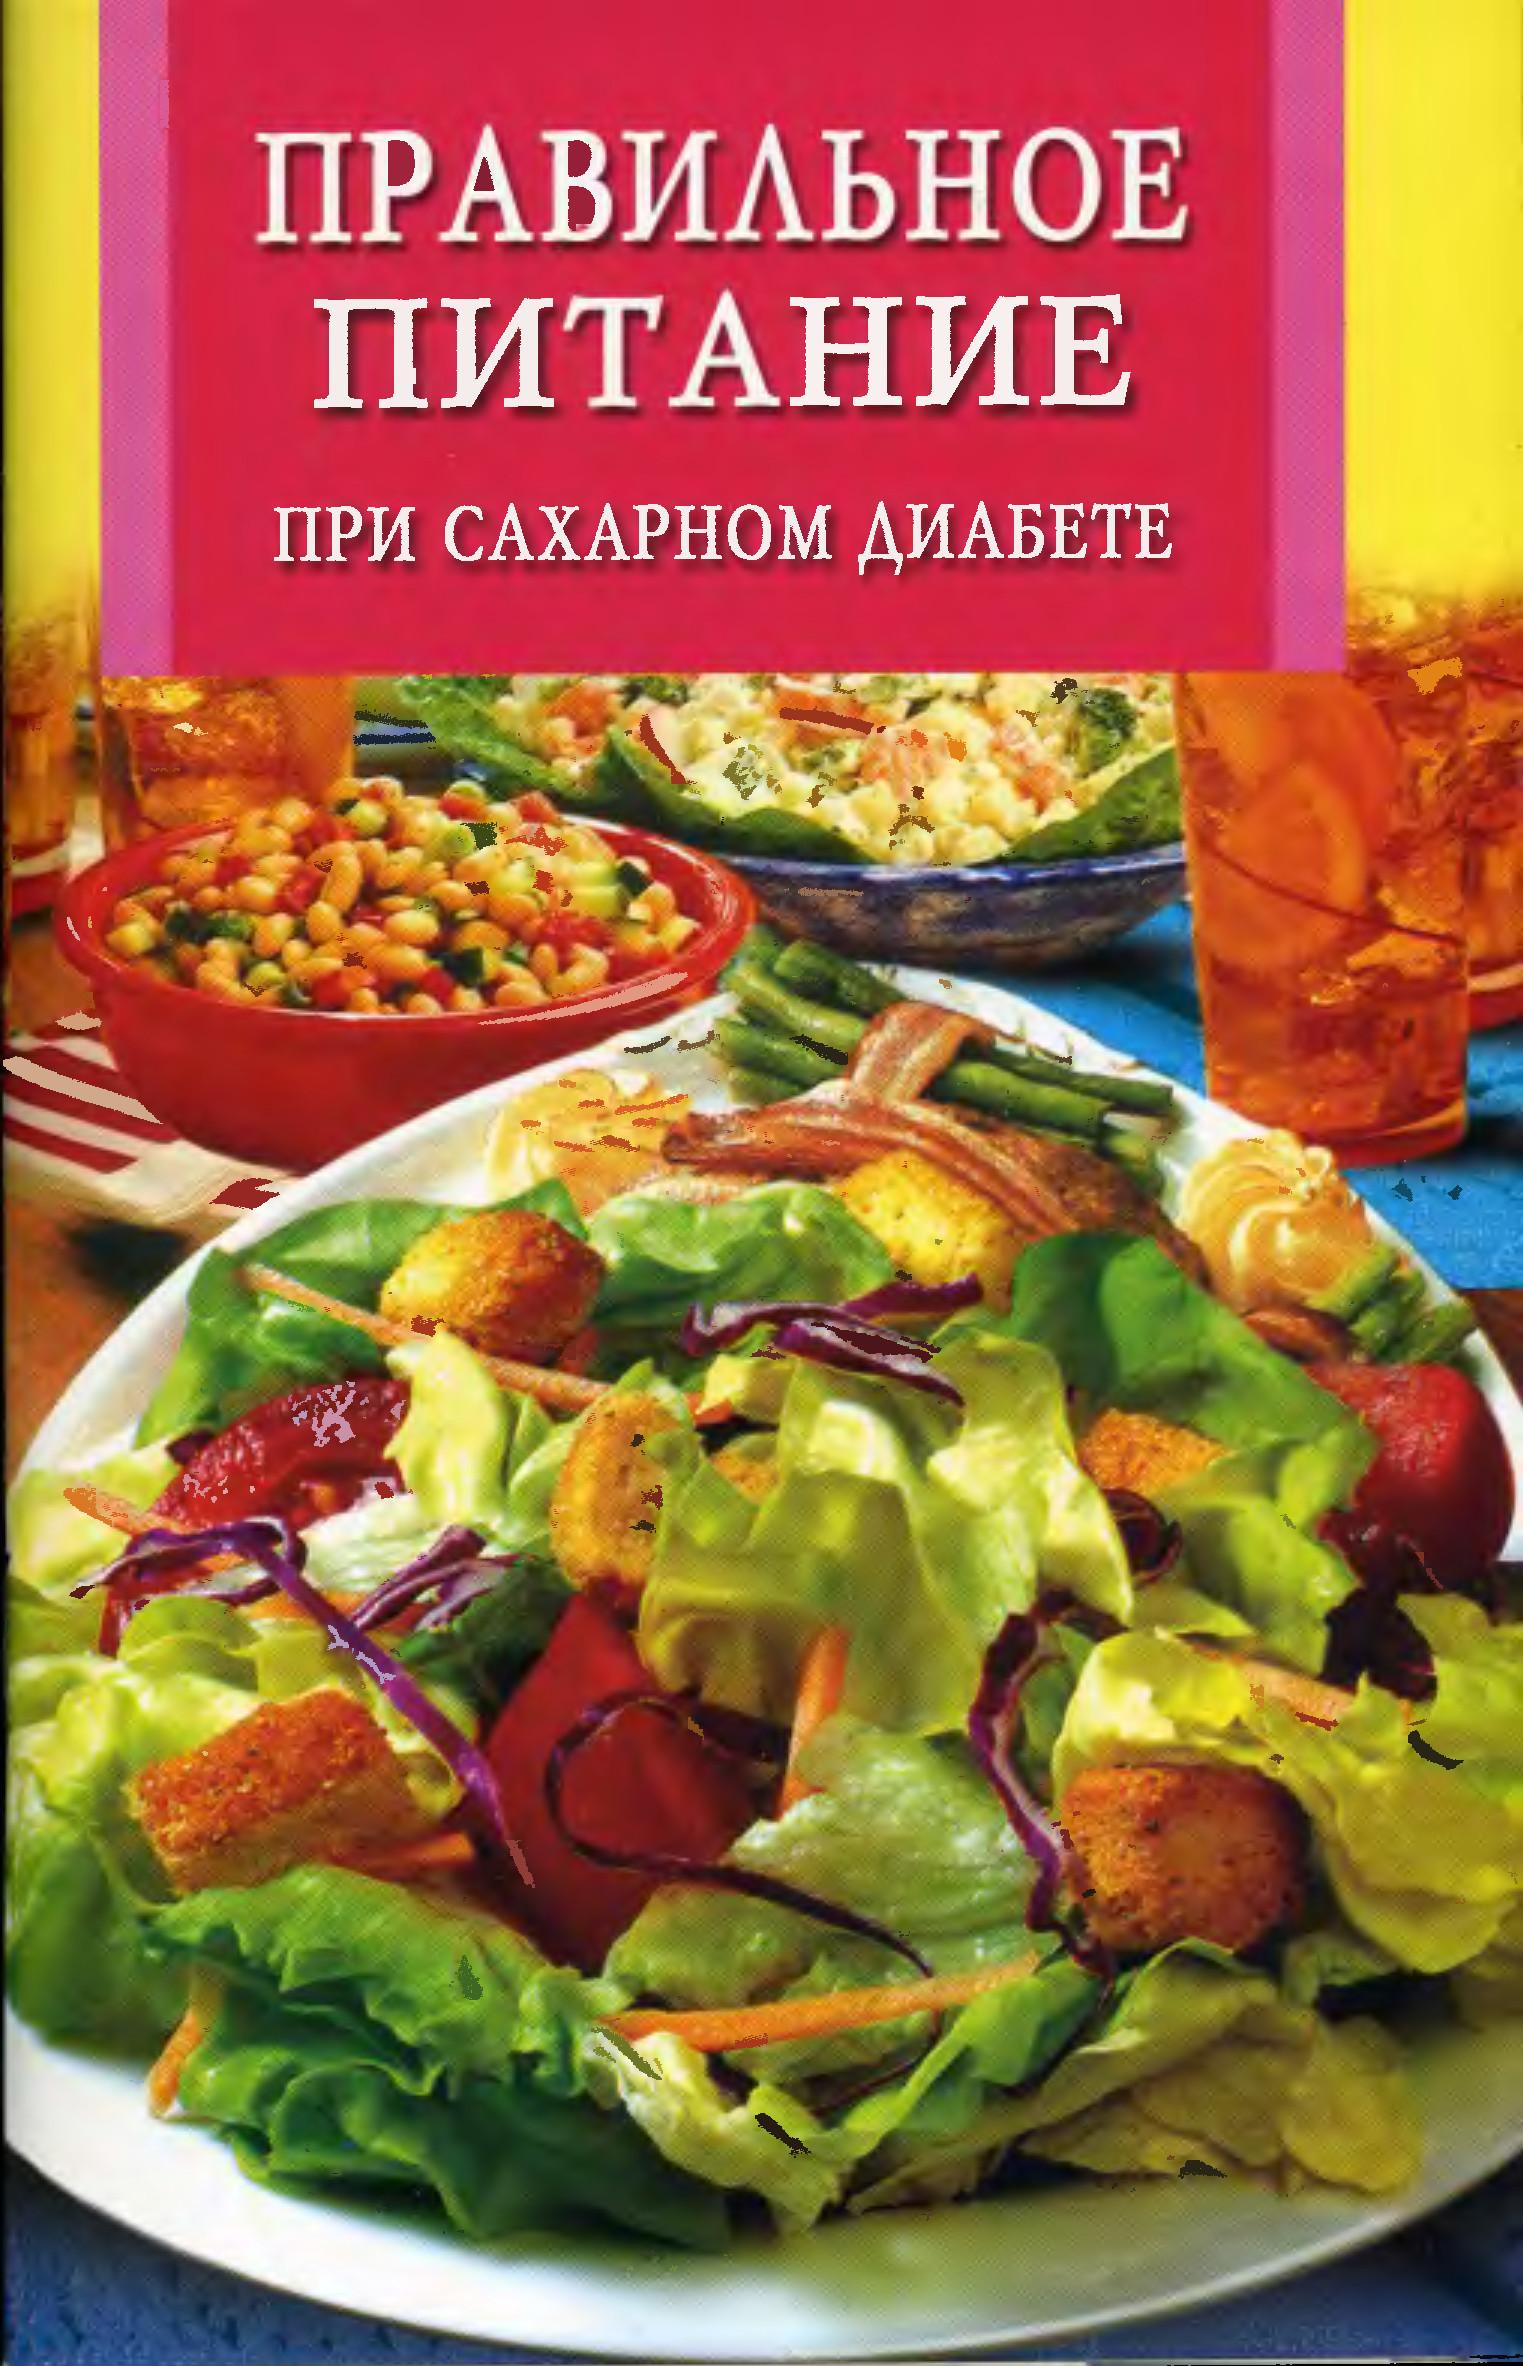 Рецепты блюд при сахарном диабете первого типа